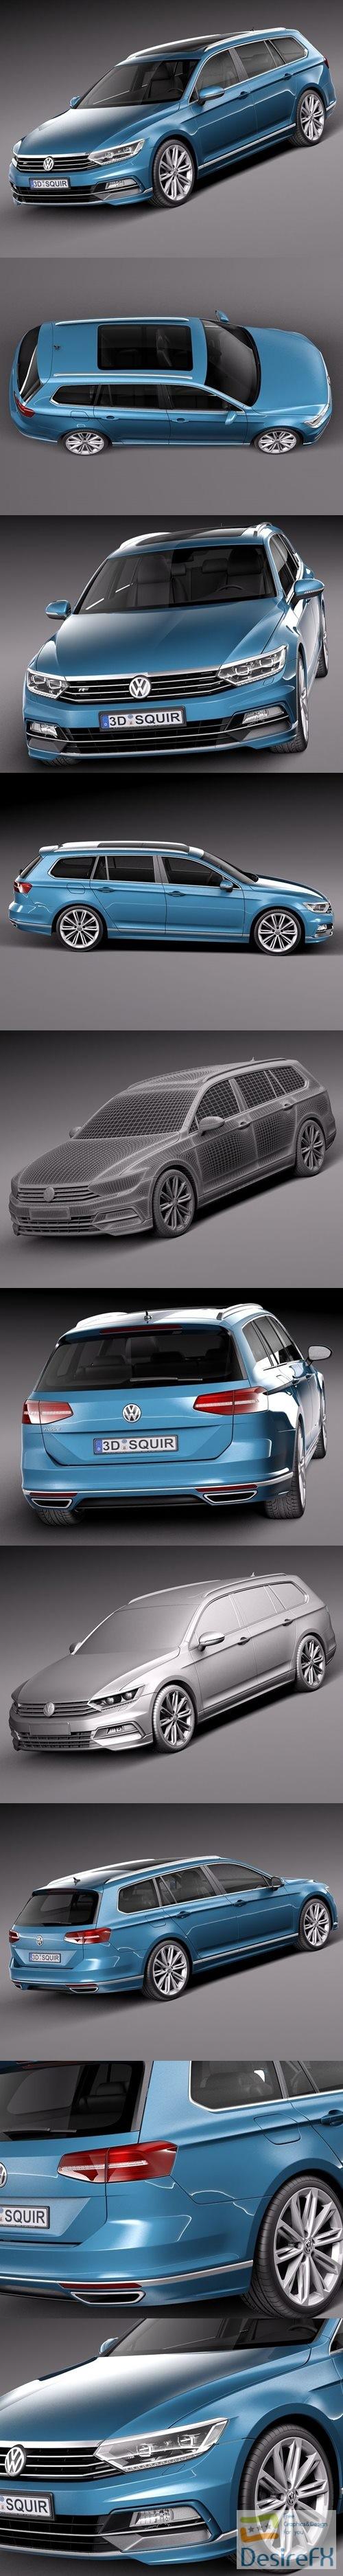 3d-models - Volkswagen Passat Variant R-line 2015 3D Model